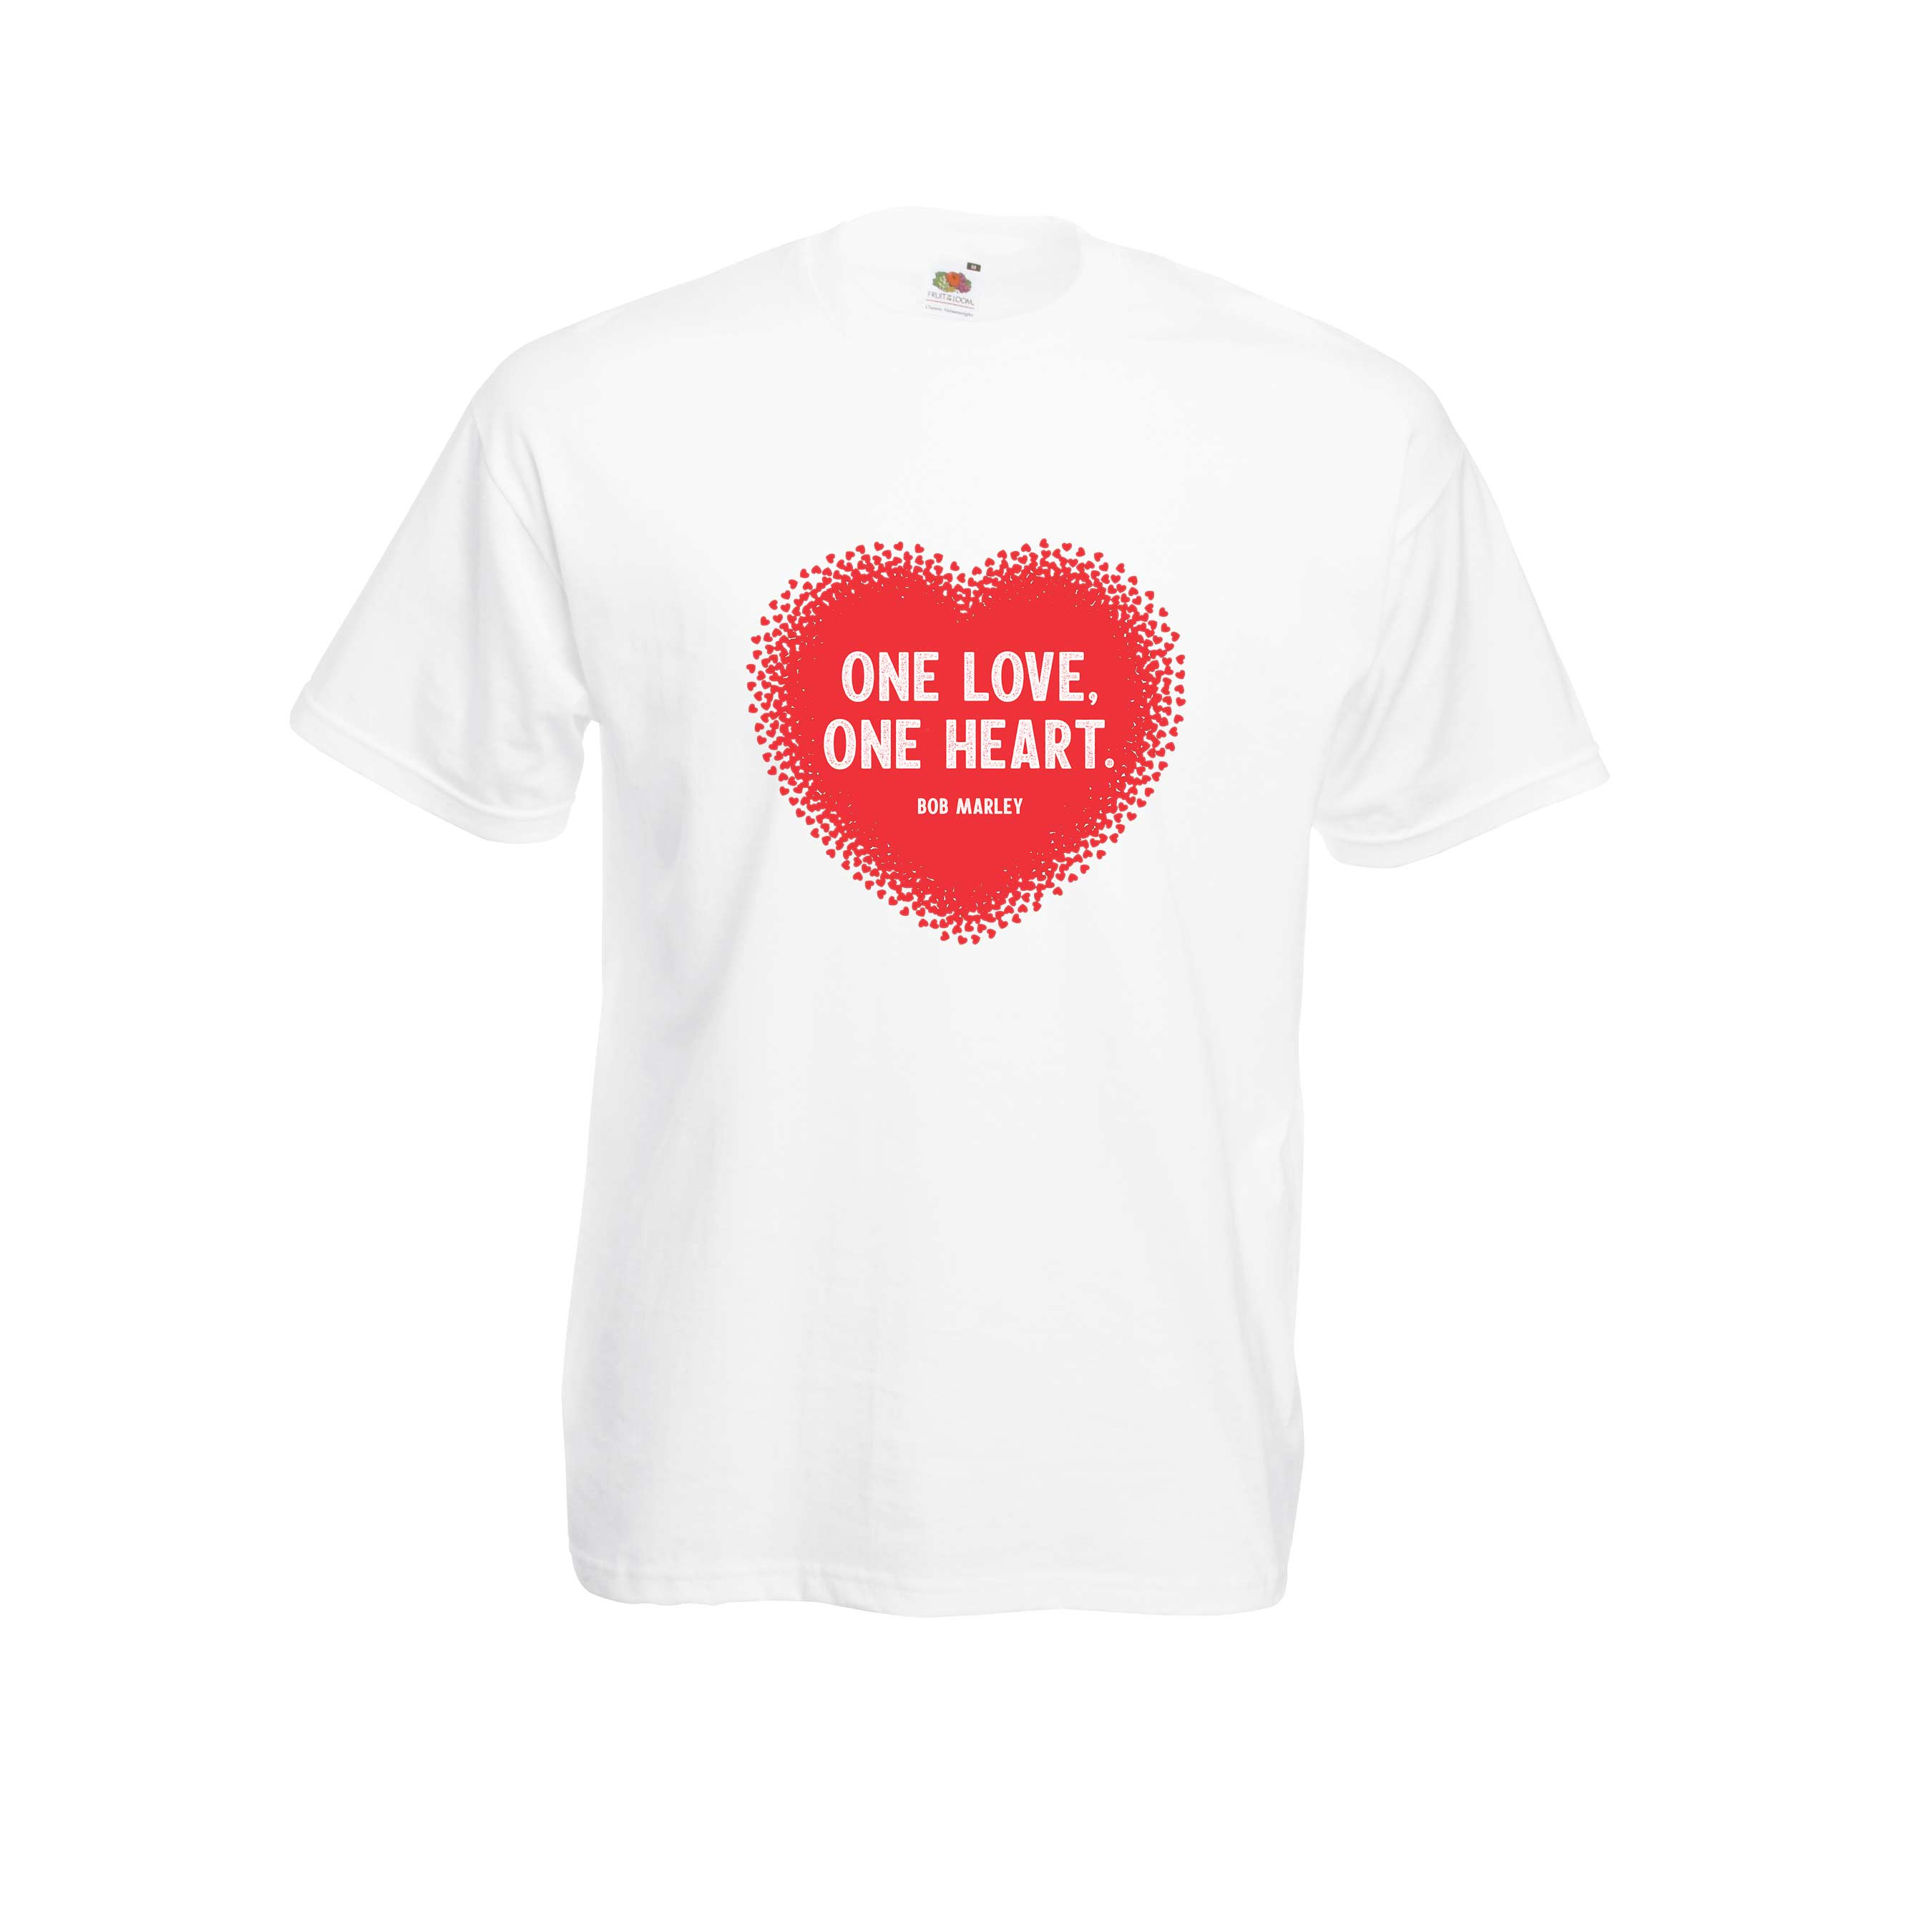 One Love design for t-shirt, hoodie & sweatshirt